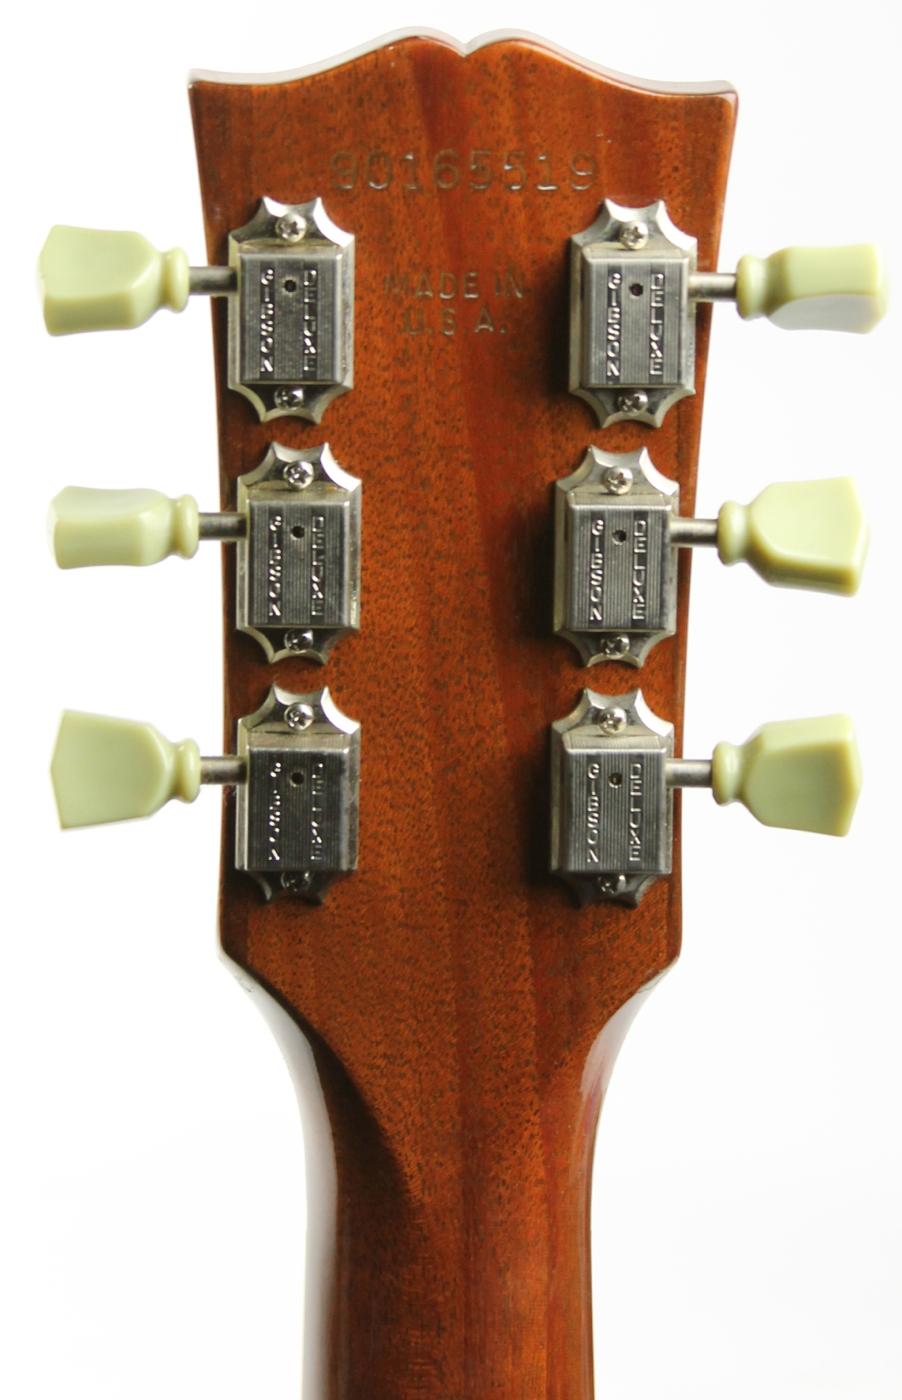 Gibson Robot Wiring Automotive Diagram 57 Classic Pickup Les Paul Standard Plus 1995 Tobacco Sunburst Guitar Switch